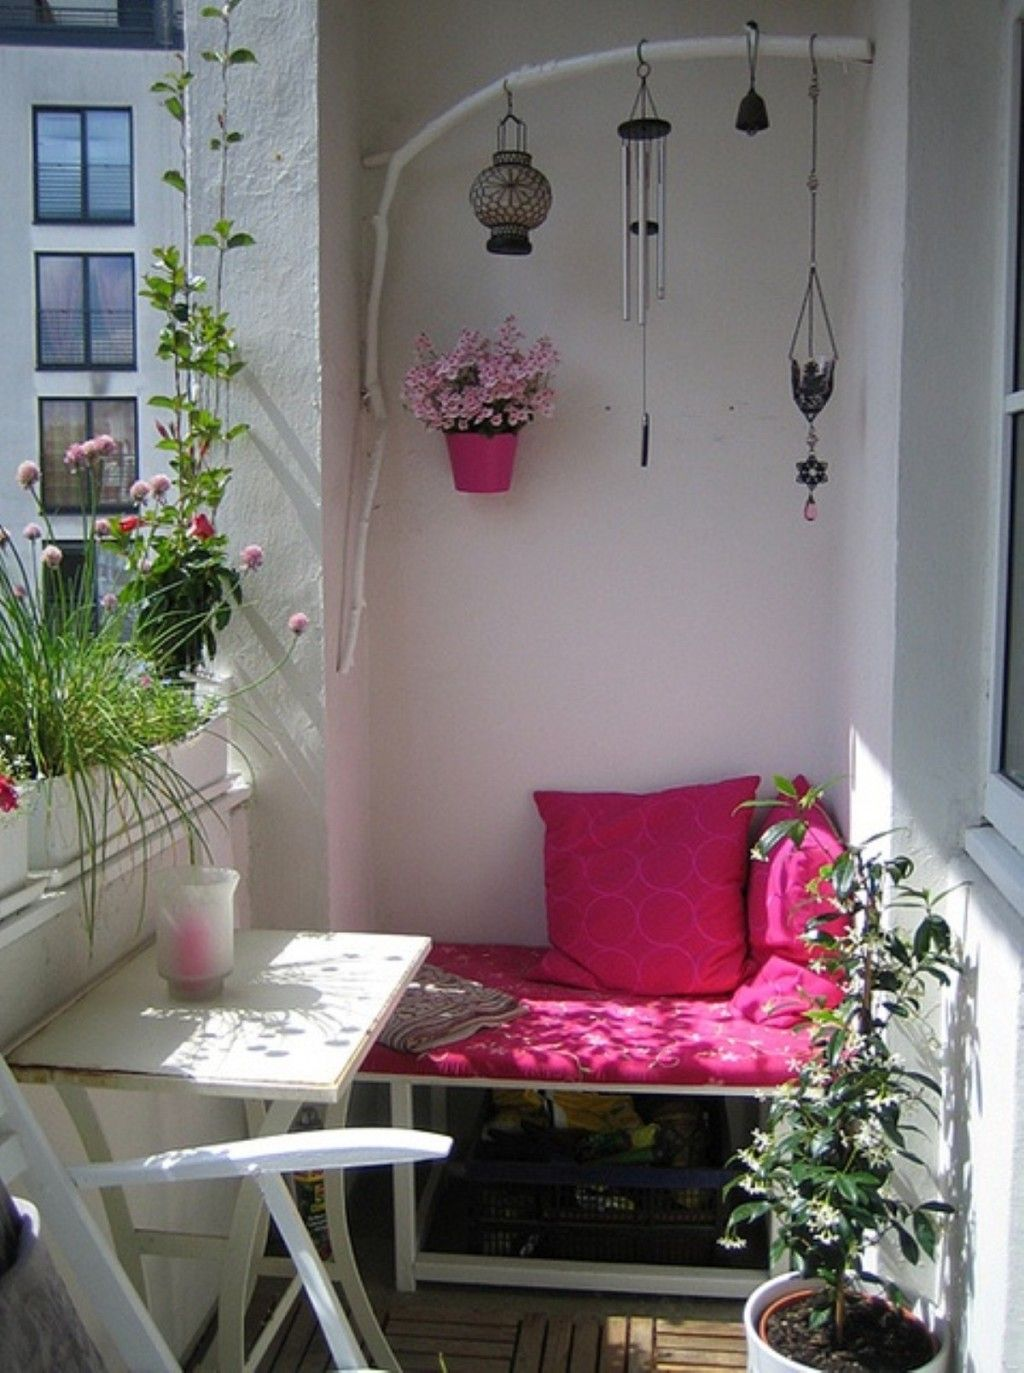 Fullsize Of Home Decor Examples